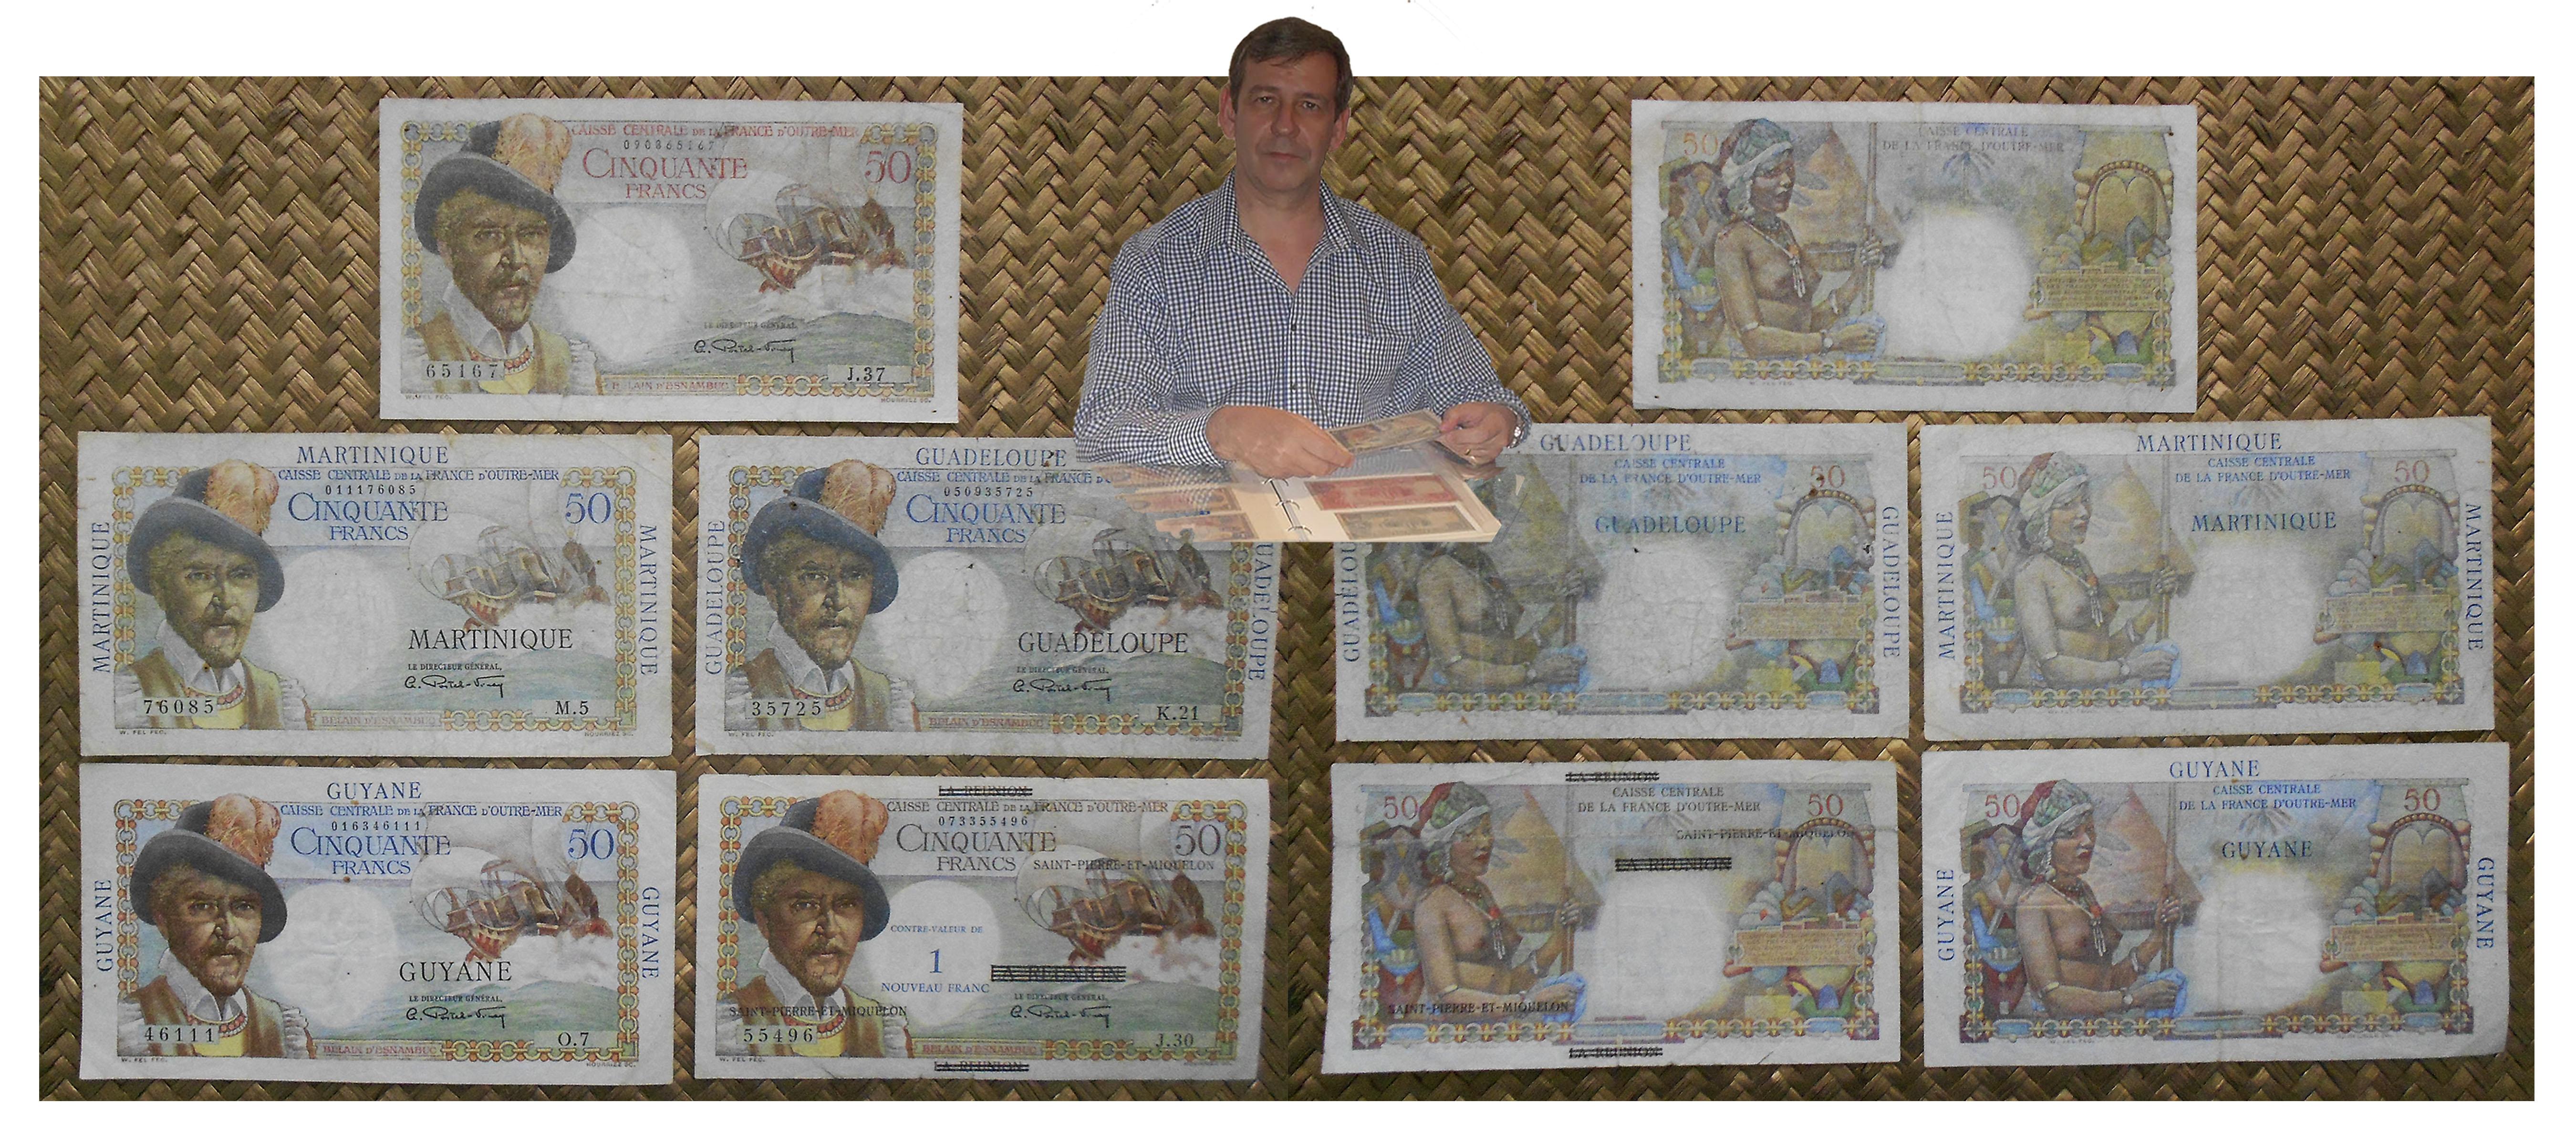 colonias francesas de ultramar 50 francos belain d'esnambuc 1947-1960 anversos y reversos